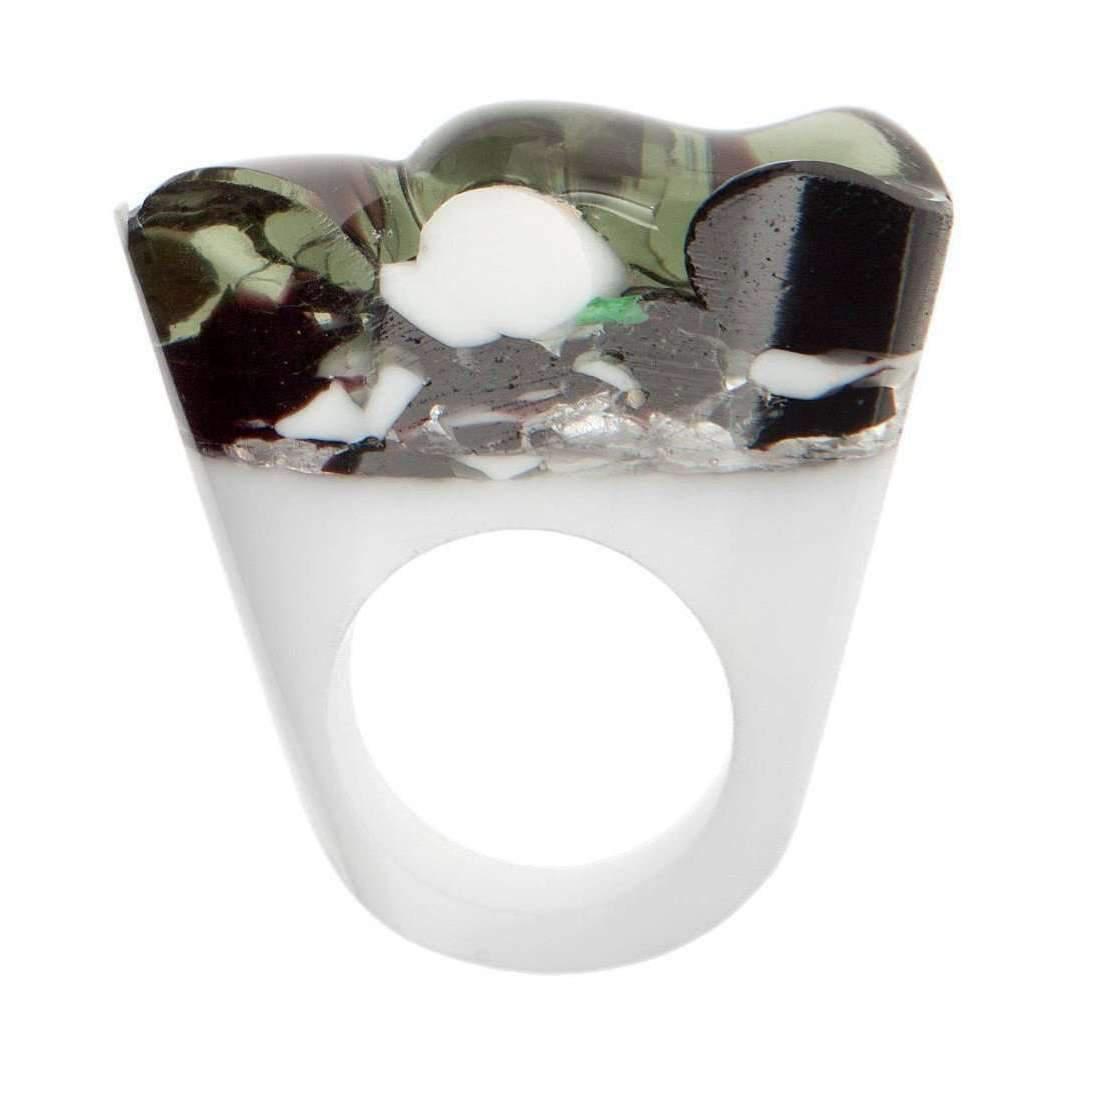 Pasionae Murano Ring - B&W - Delight - UK N - US 6 1/2 - EU 54 CtmKGZ